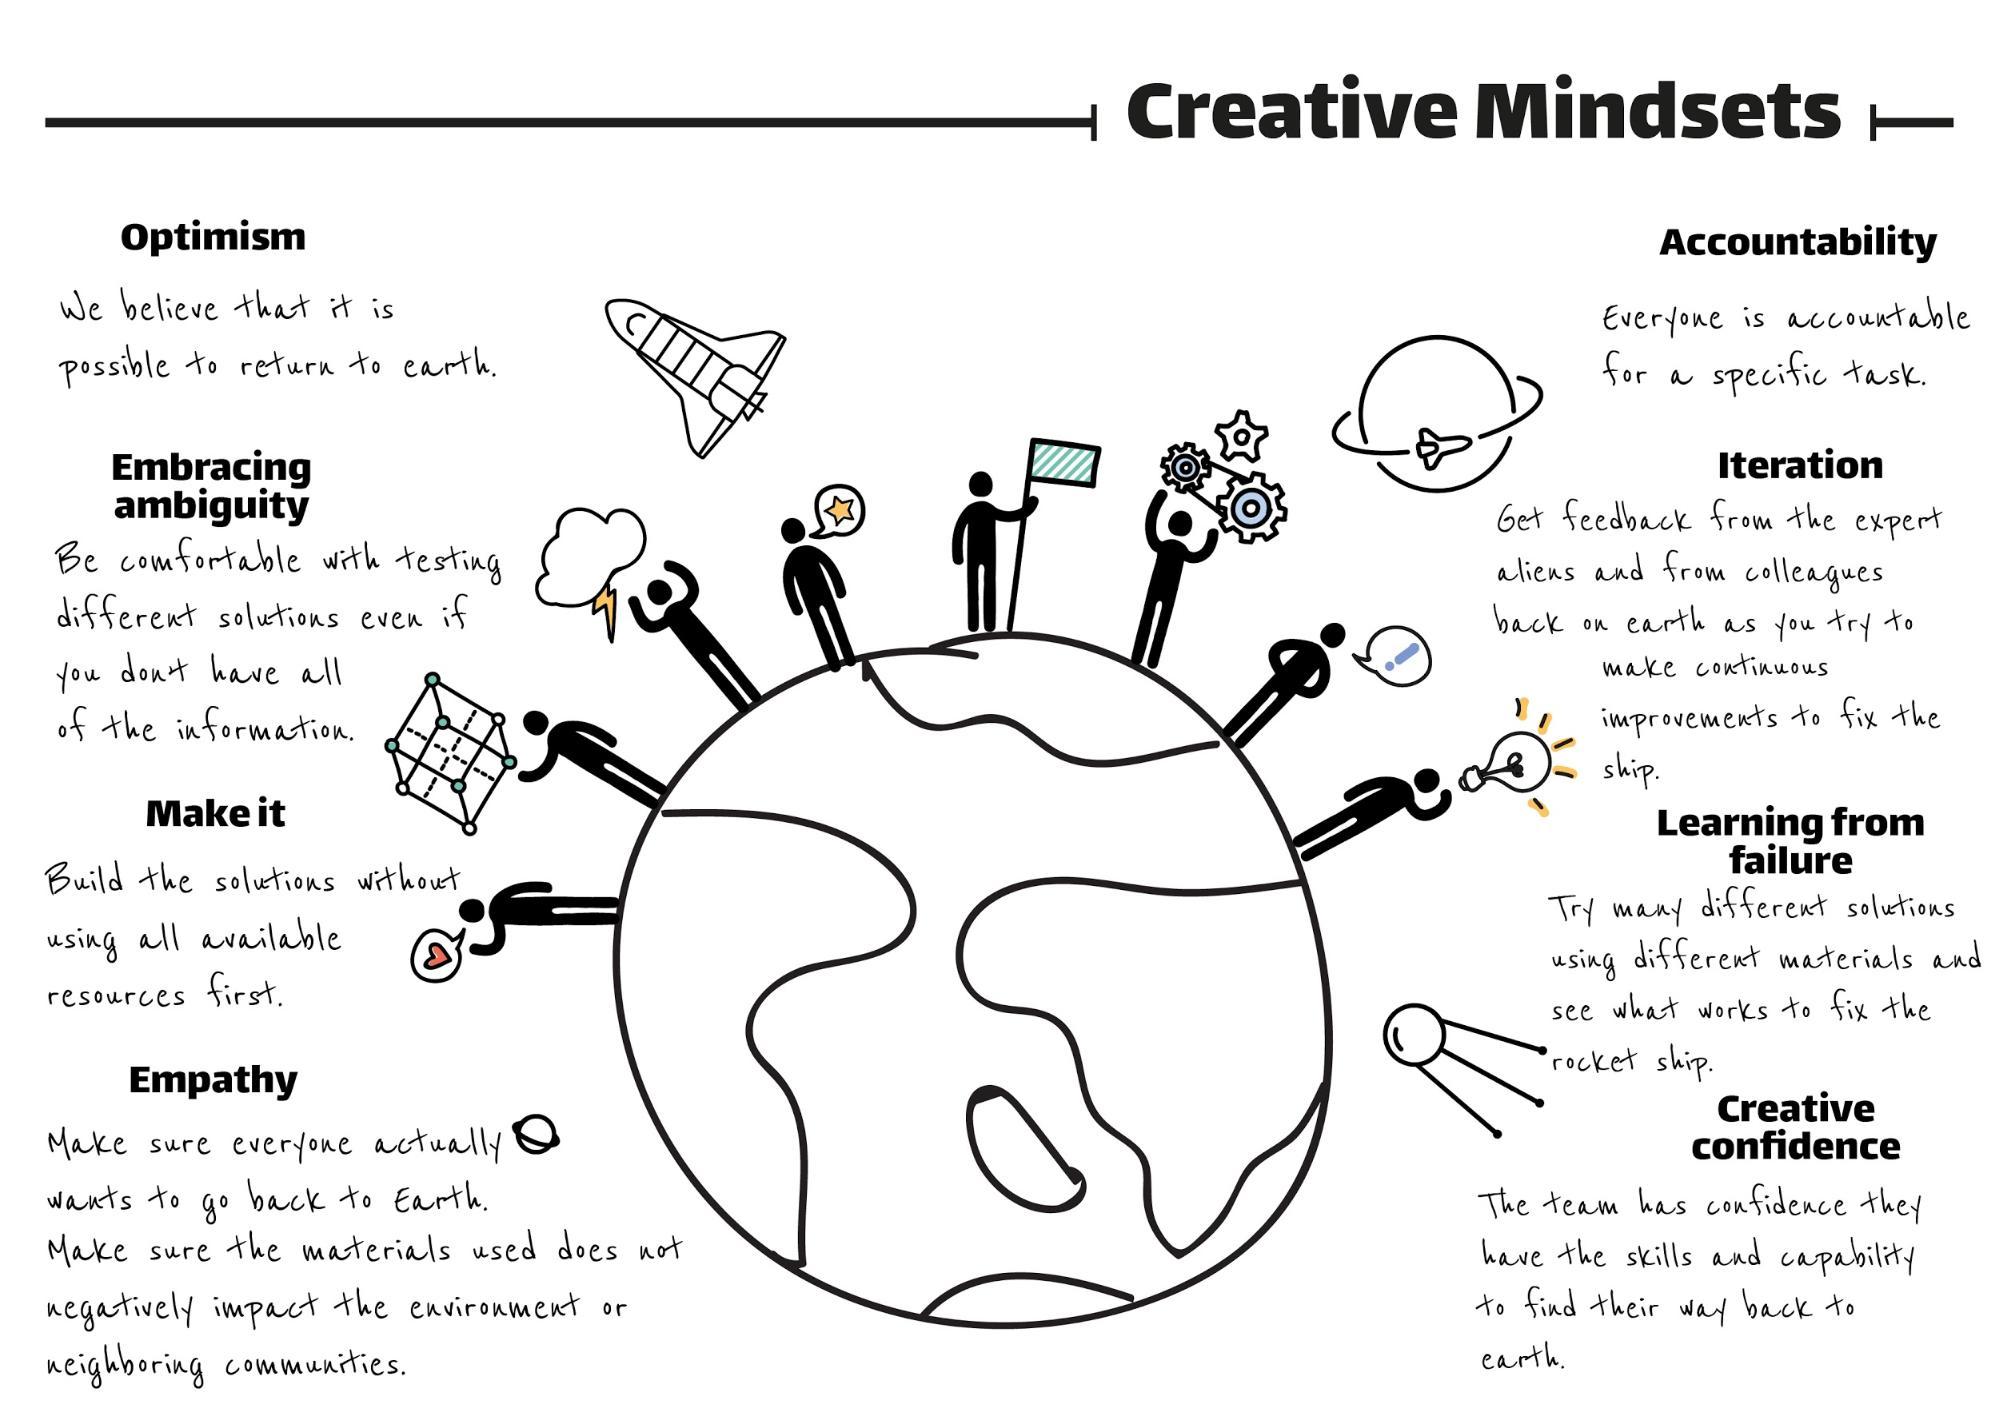 Creative Mindsets image